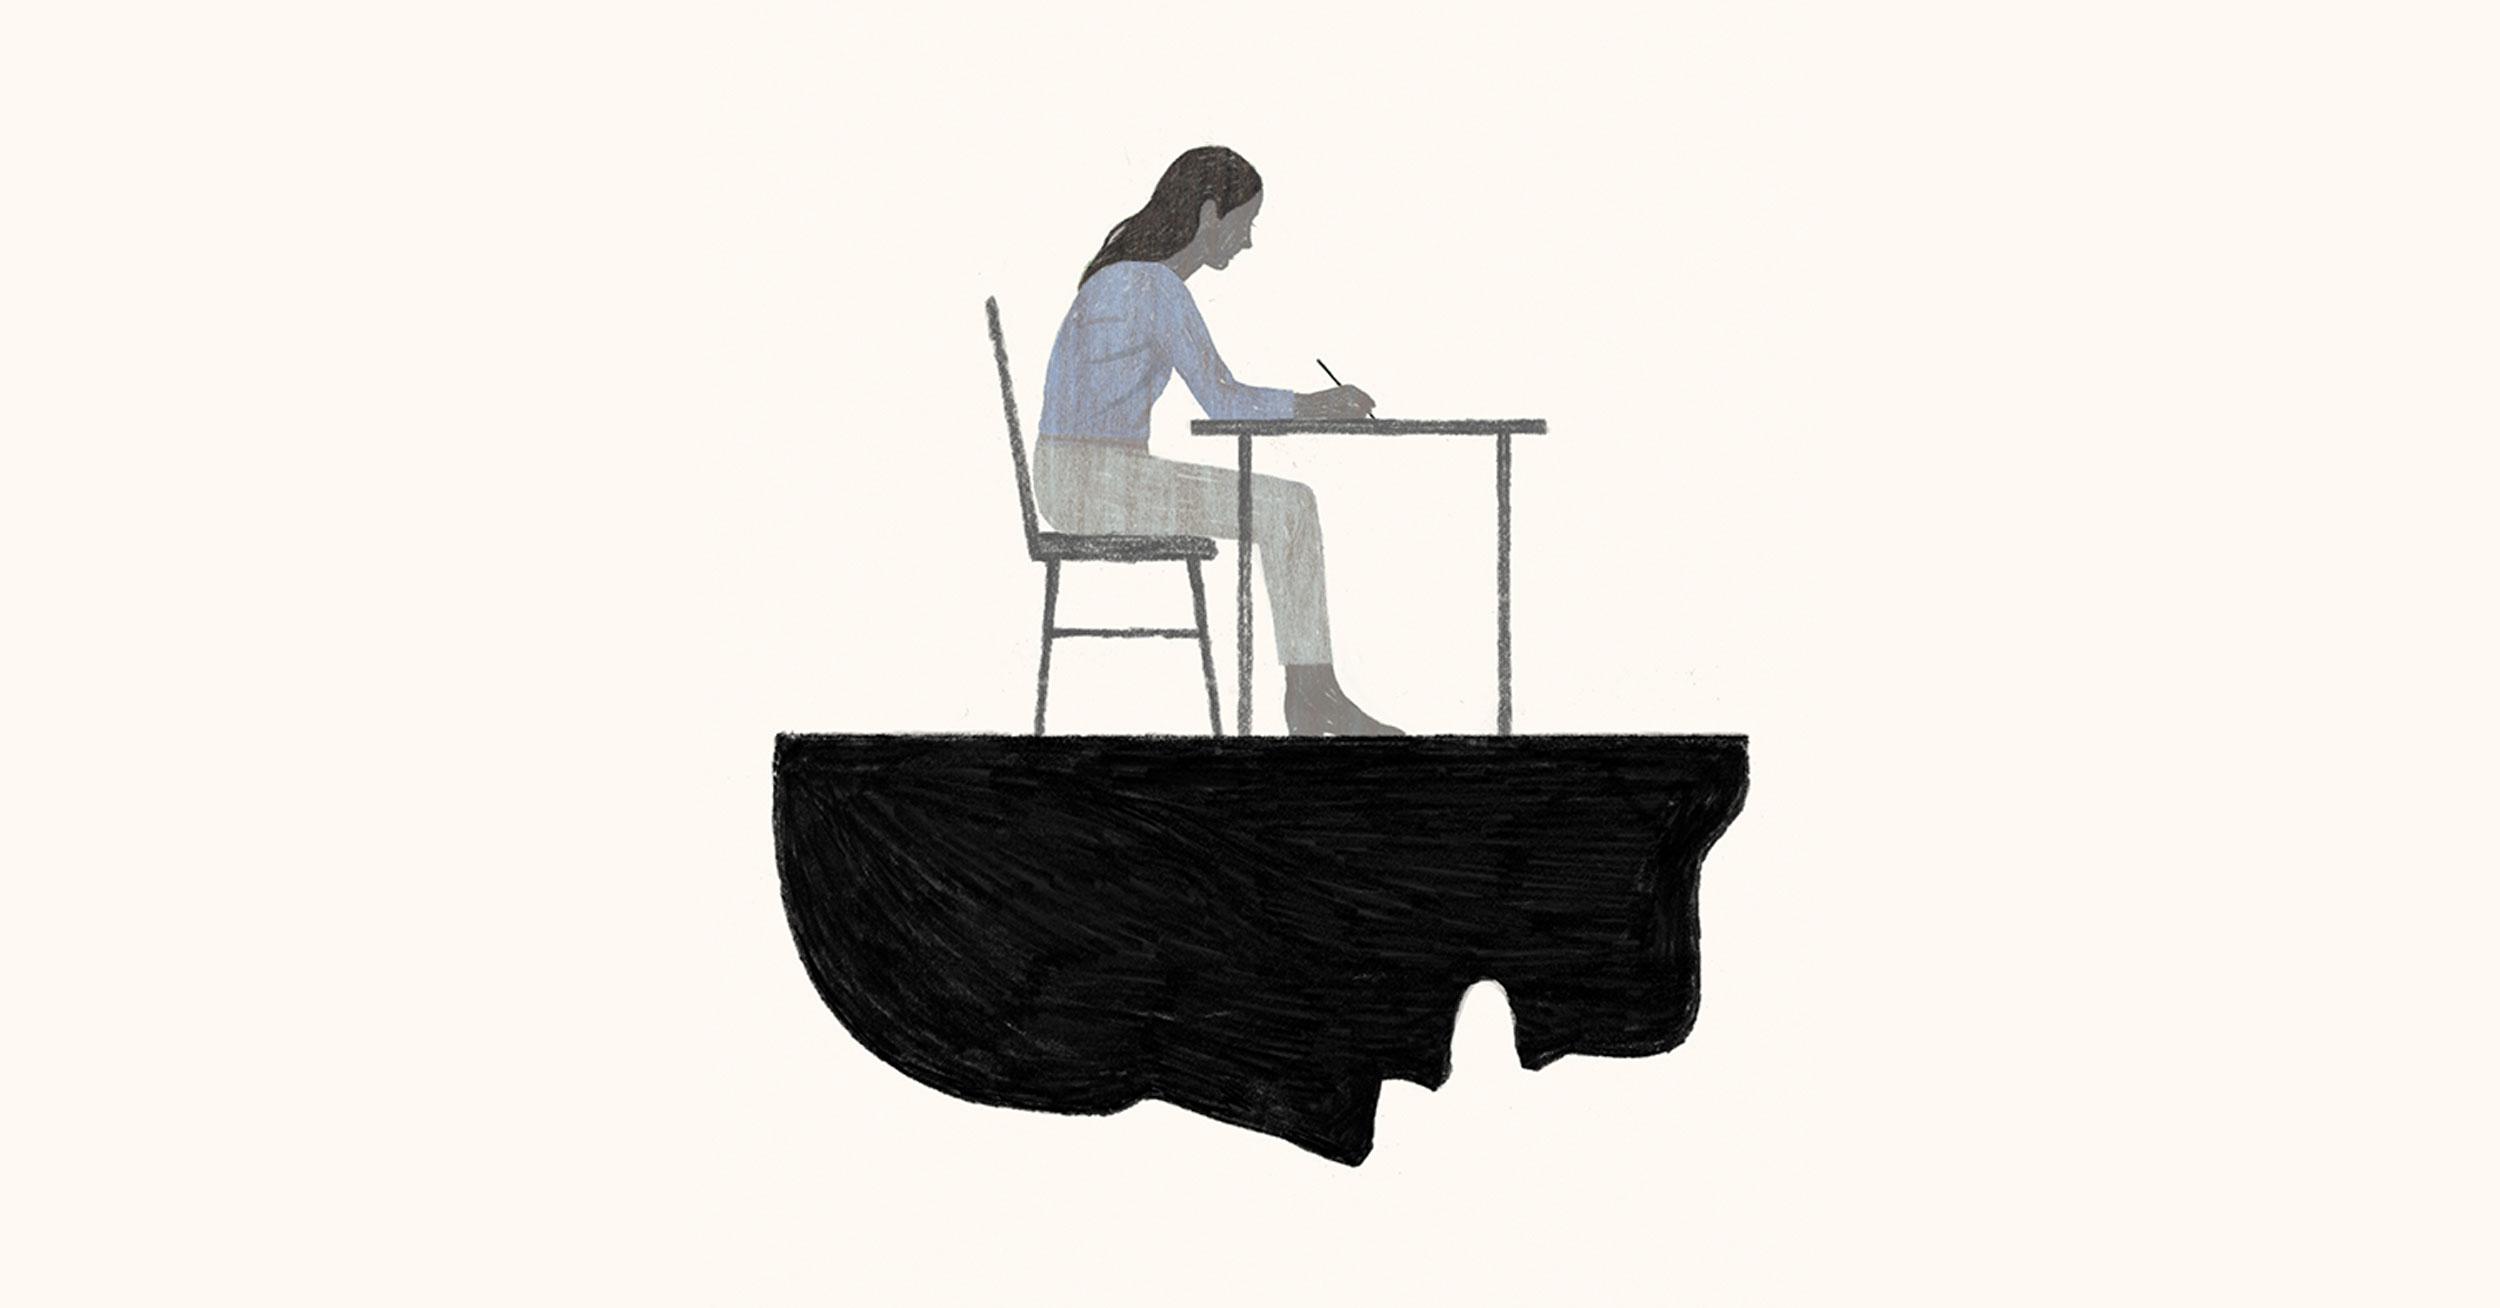 The Reluctant Memoirist